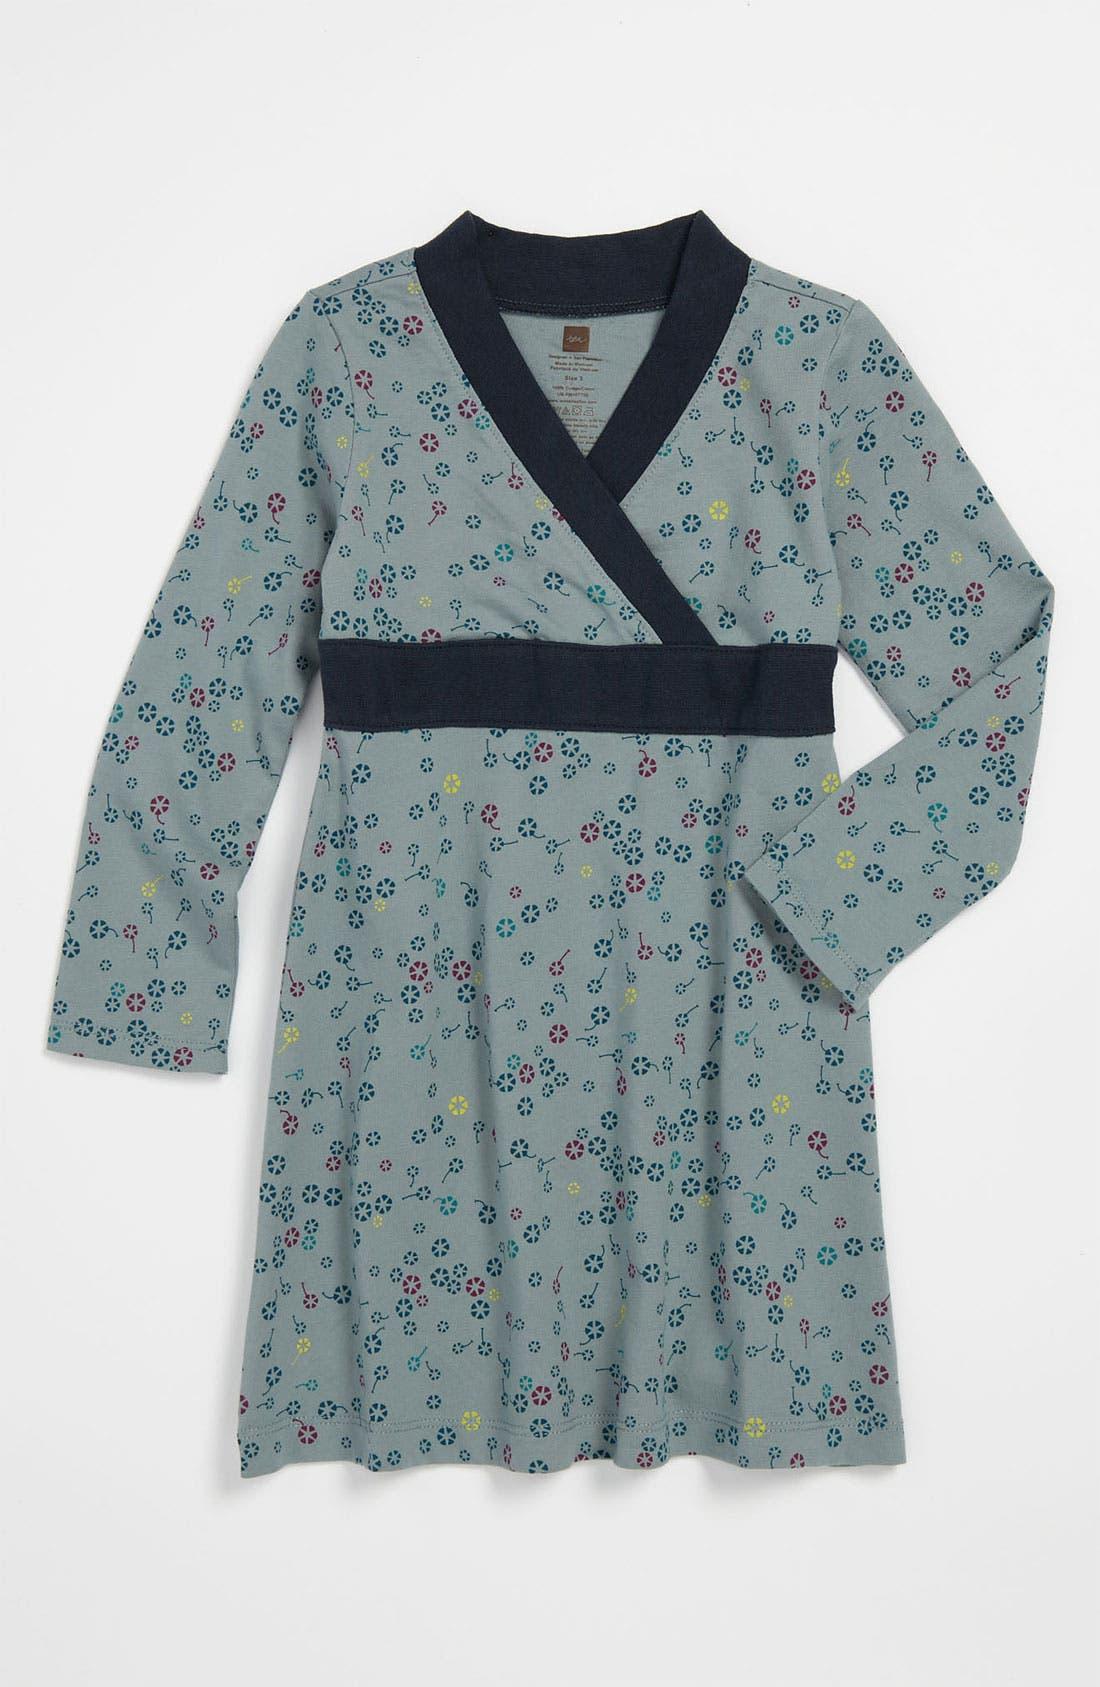 Alternate Image 1 Selected - Tea Collection Wrap Dress (Toddler)